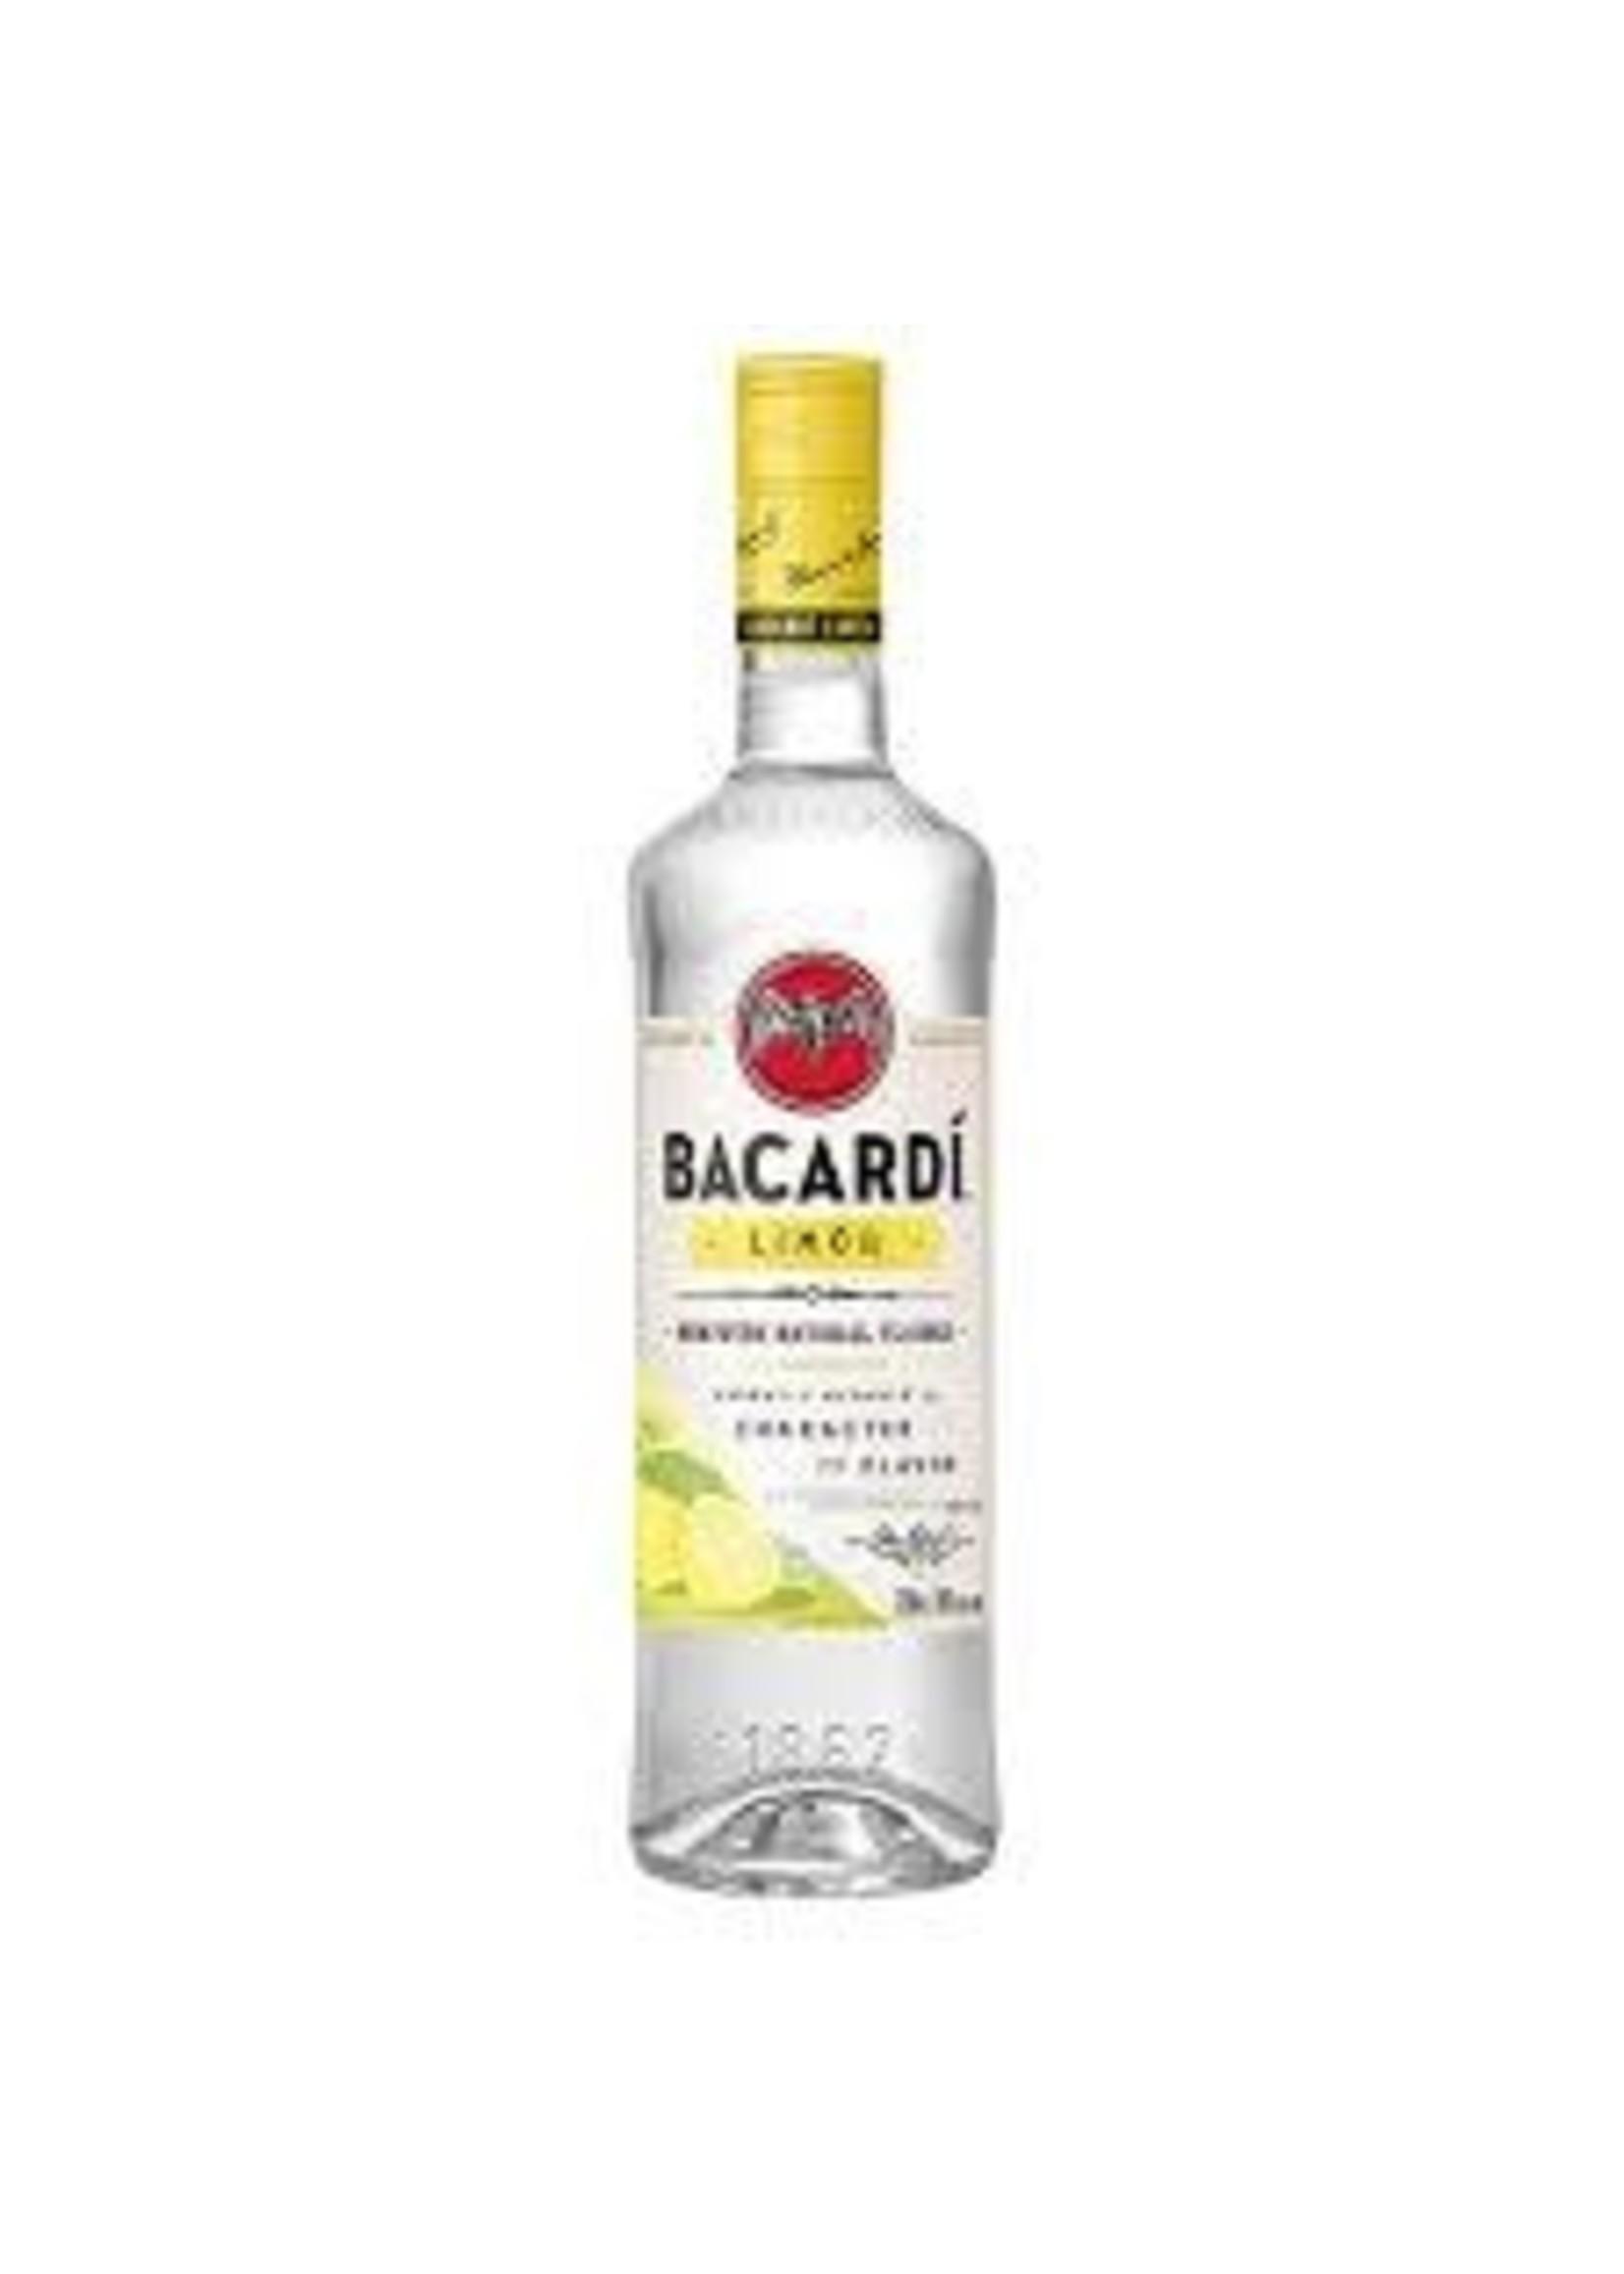 BACARDI Bacardi / Limon